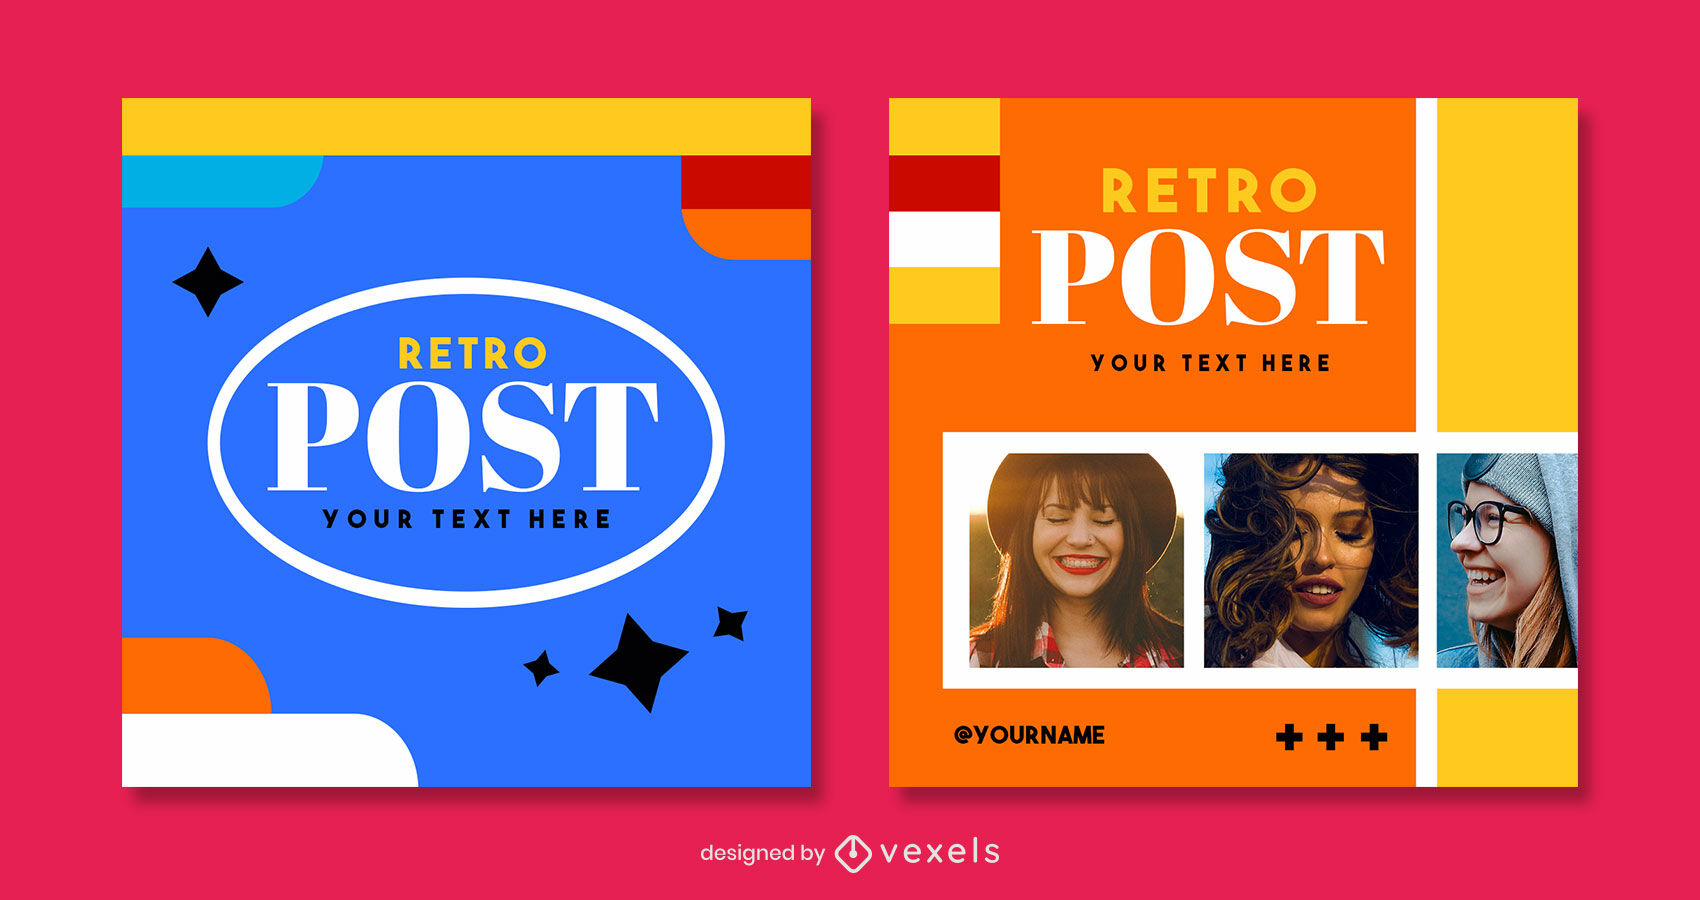 Retro bunte Instagram-Post-Vorlage psd